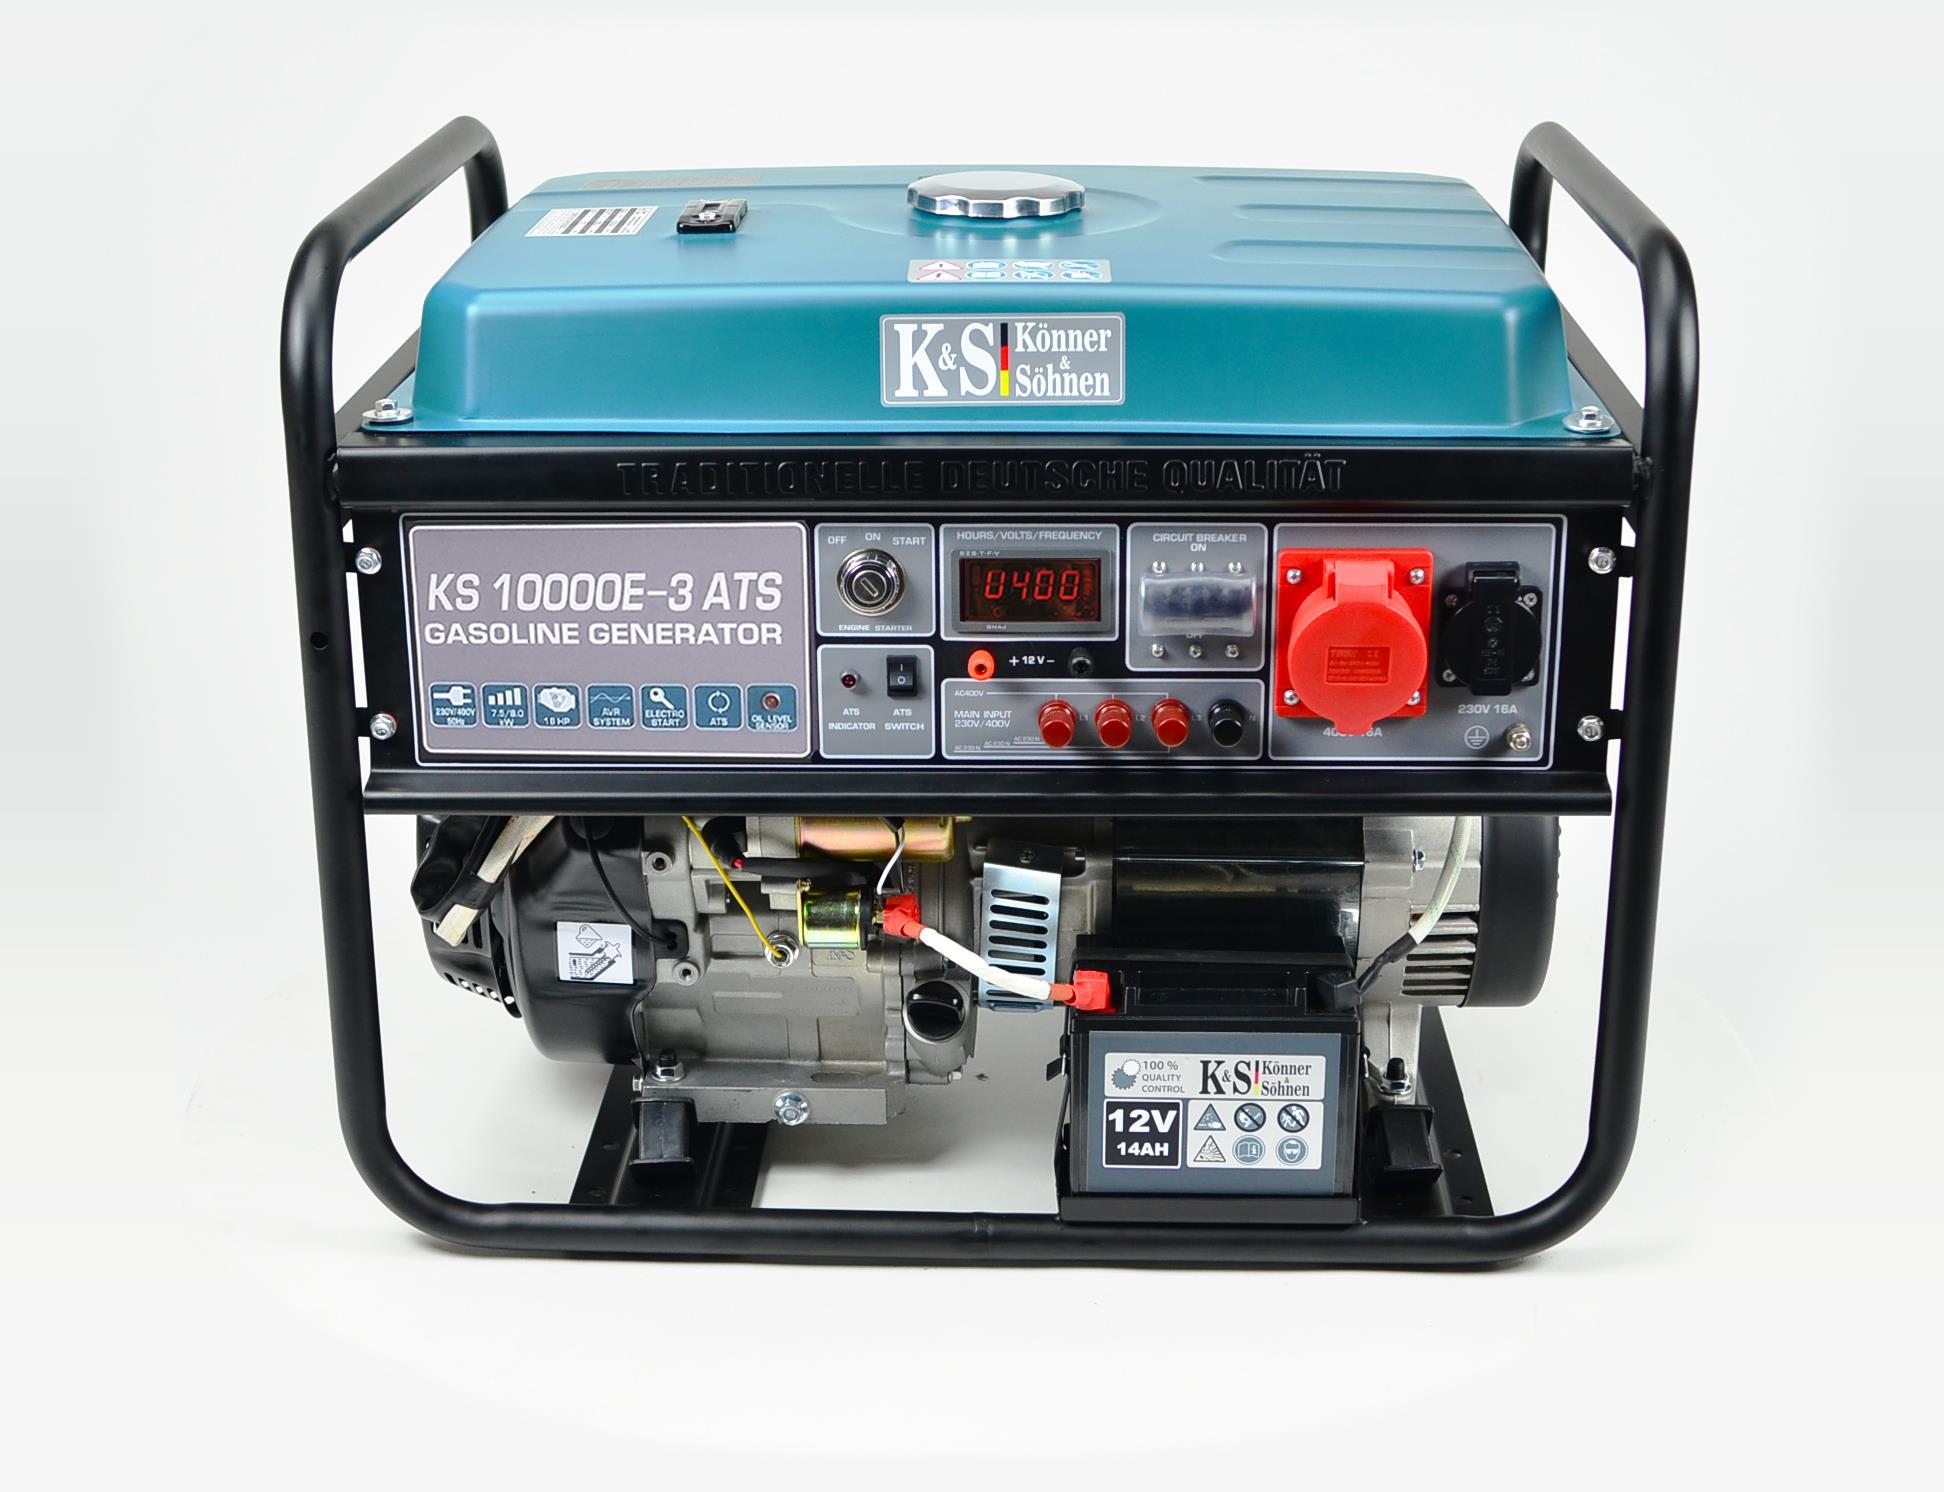 K&S 8 kVA Benzin KS10000E-3-ATS Stromaggregat  inkl. ATS